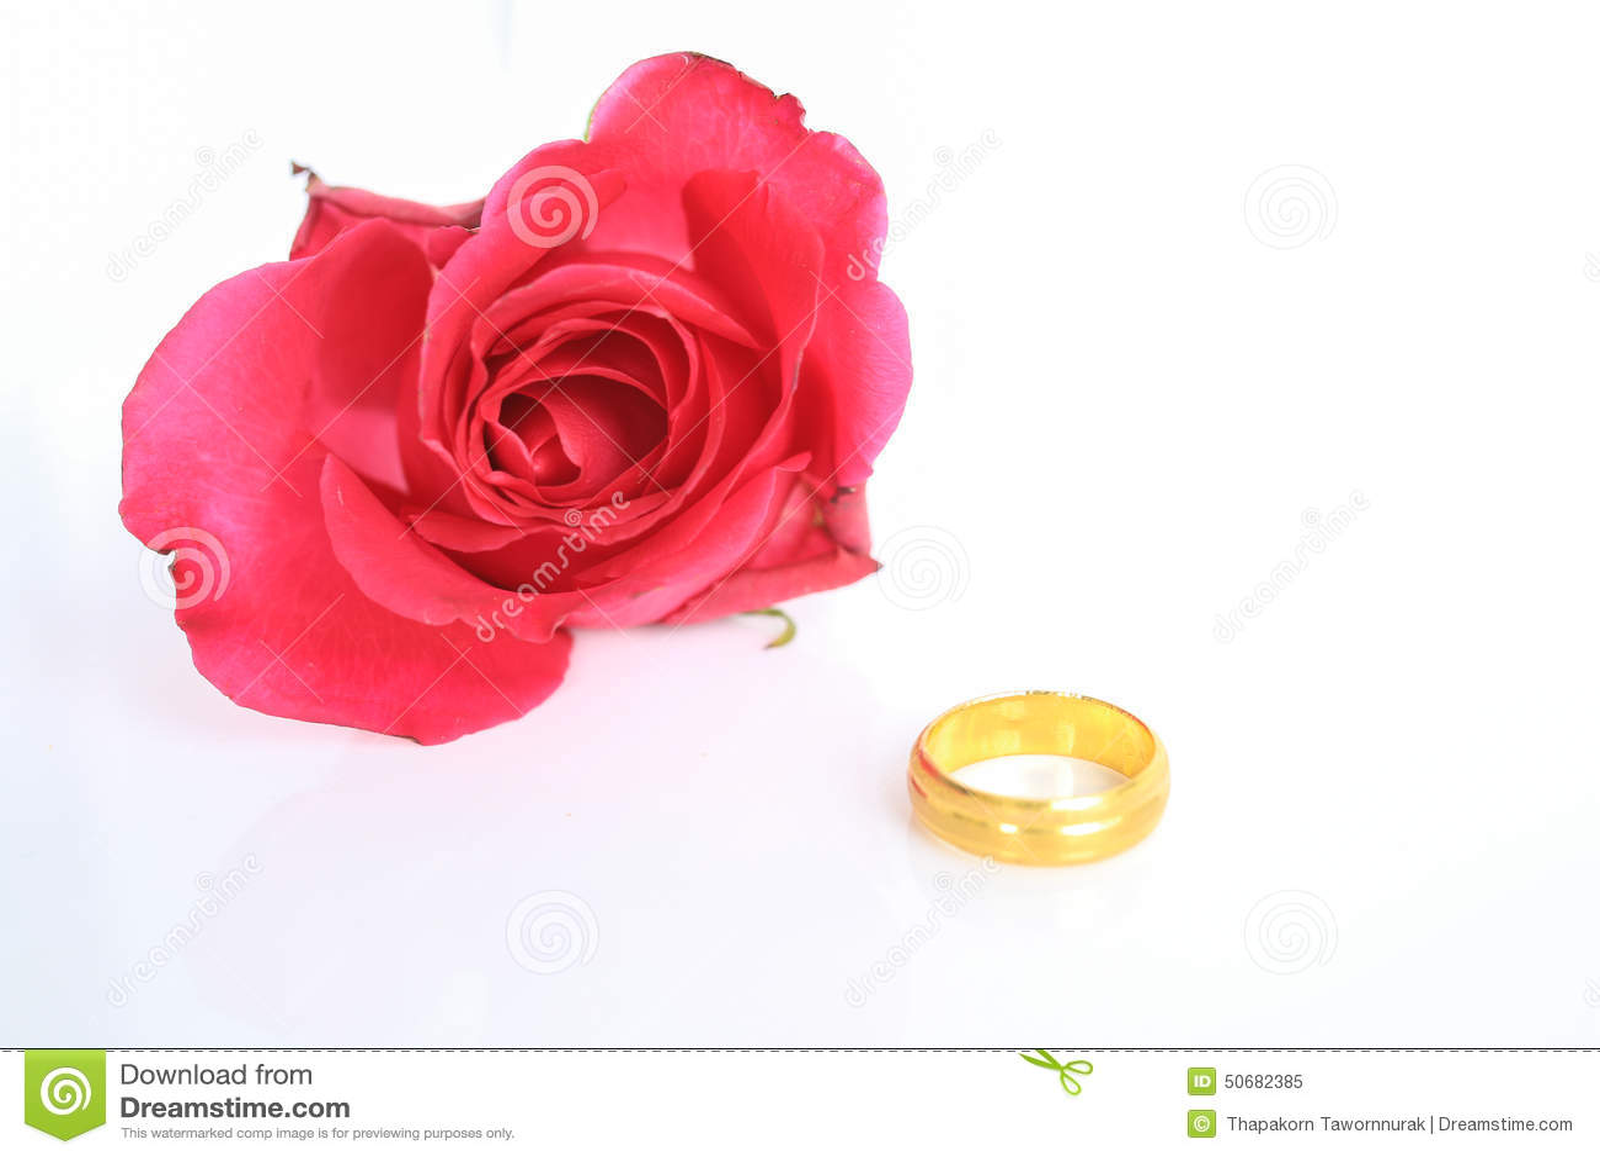 Download 与圆环的红色玫瑰在白色背景 库存图片. 图片 包括有 结婚, 珠宝, 婚礼, 金子, 蜜月, 花卉, beauvoir - 50682385